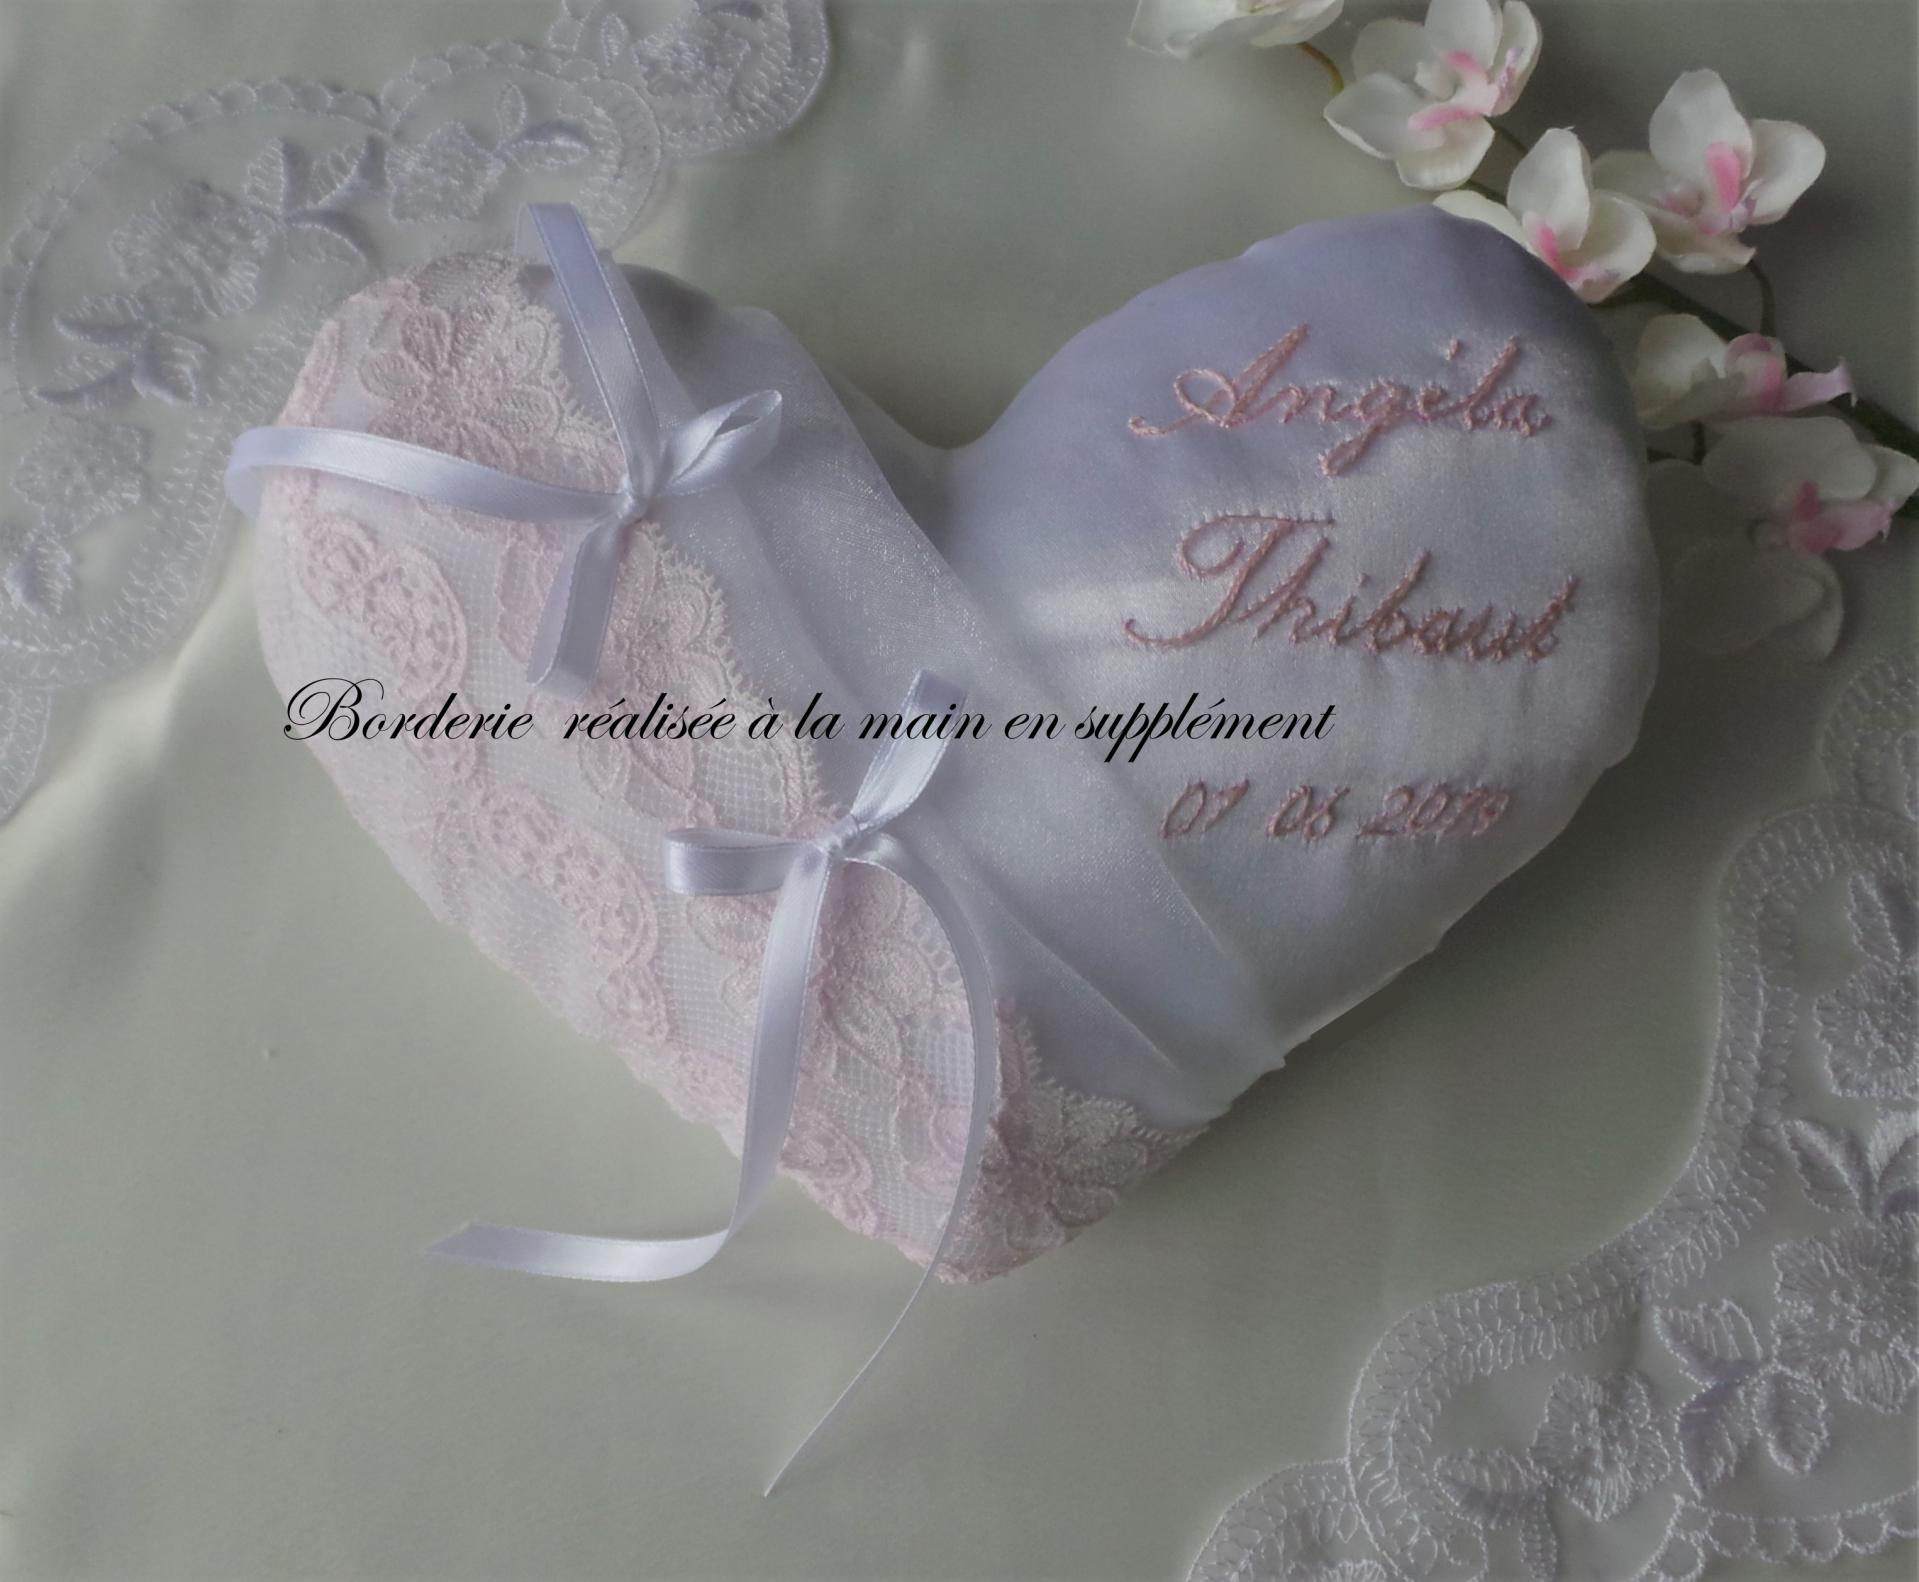 Coussin mariage coeur dentelle rose pale personnalise marque